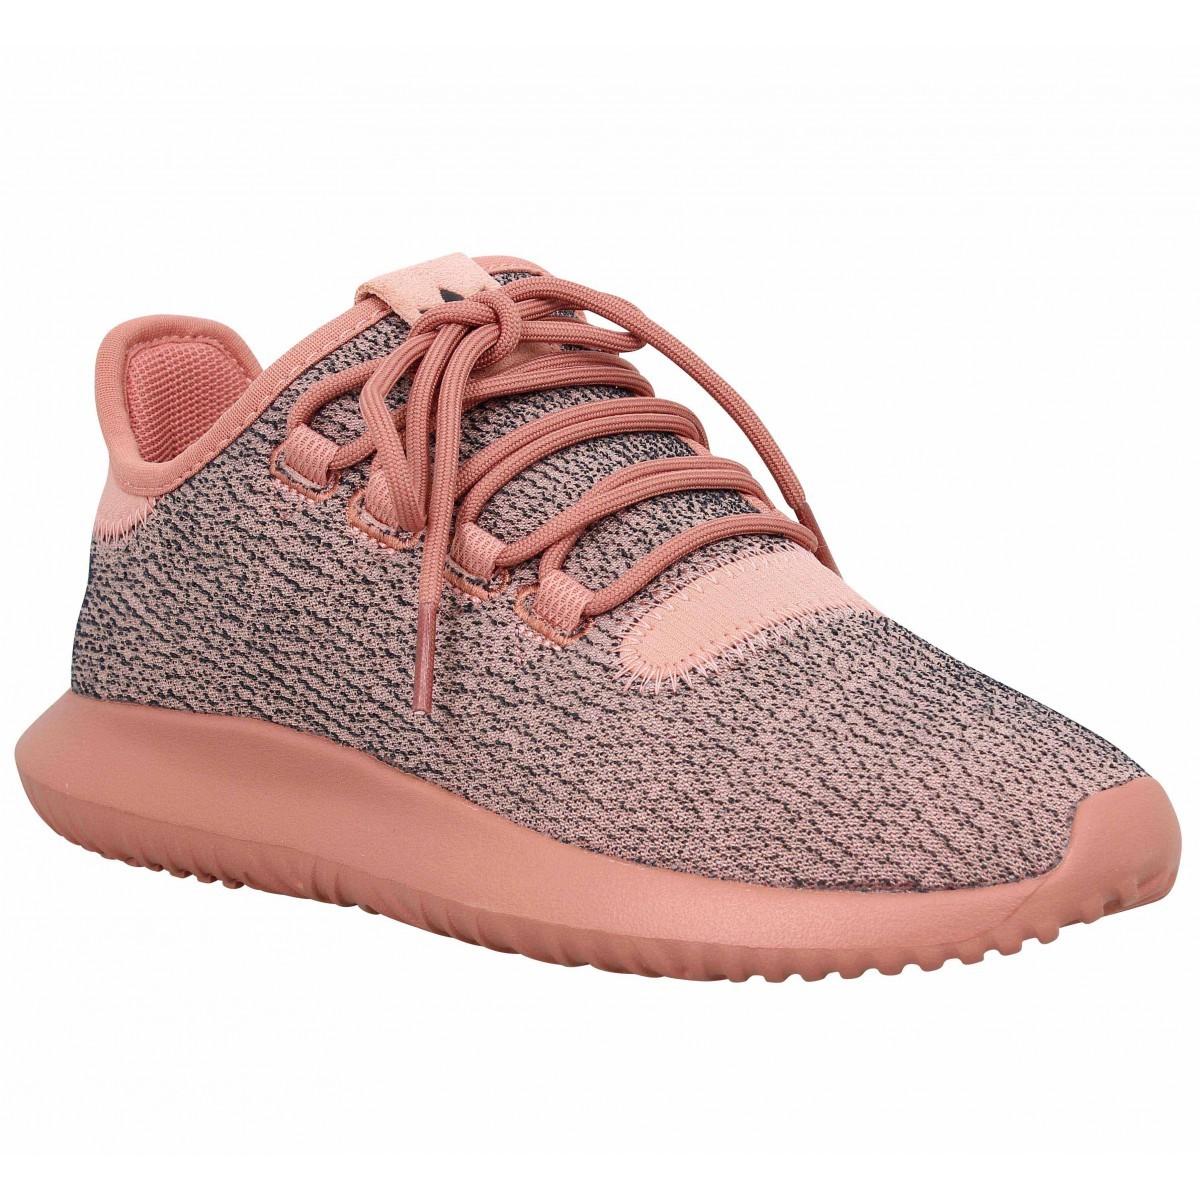 chaussure adidas tubular femmes,Chaussures & vêtements Adidas pas cher